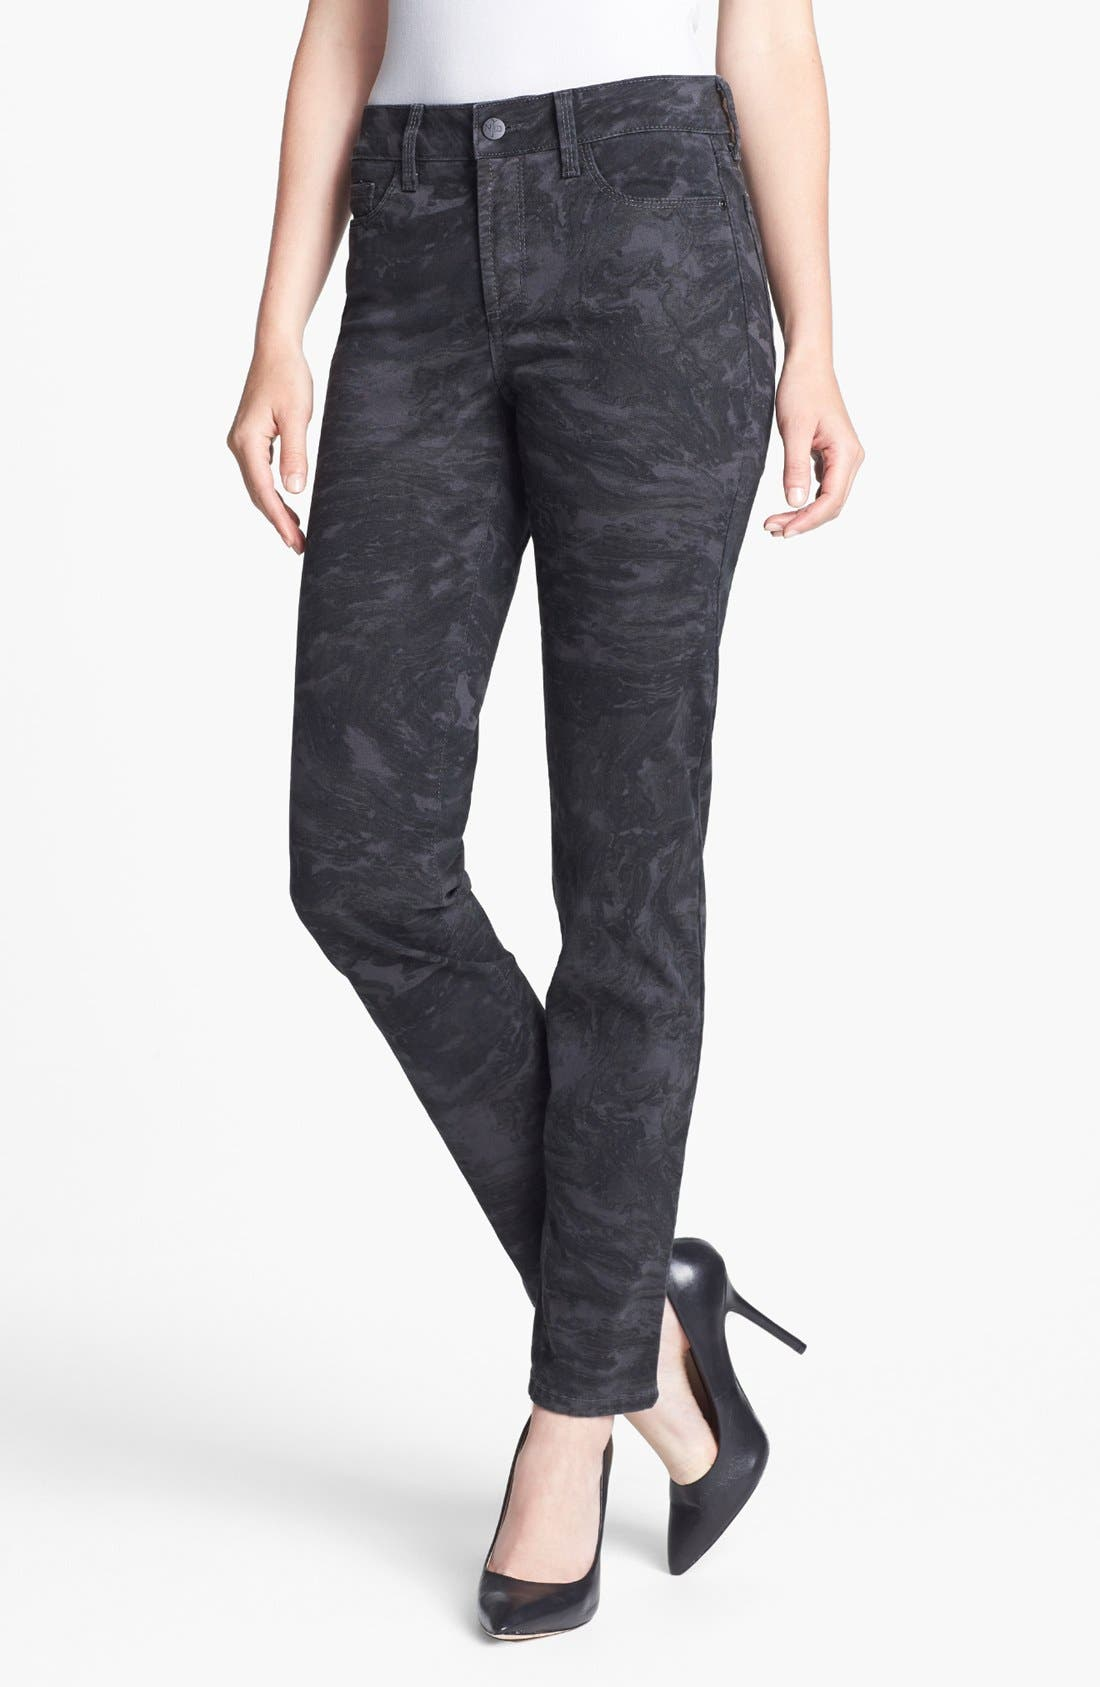 Alternate Image 1 Selected - NYDJ 'Sheri' Print Skinny Stretch Jeans (Regular & Petite)